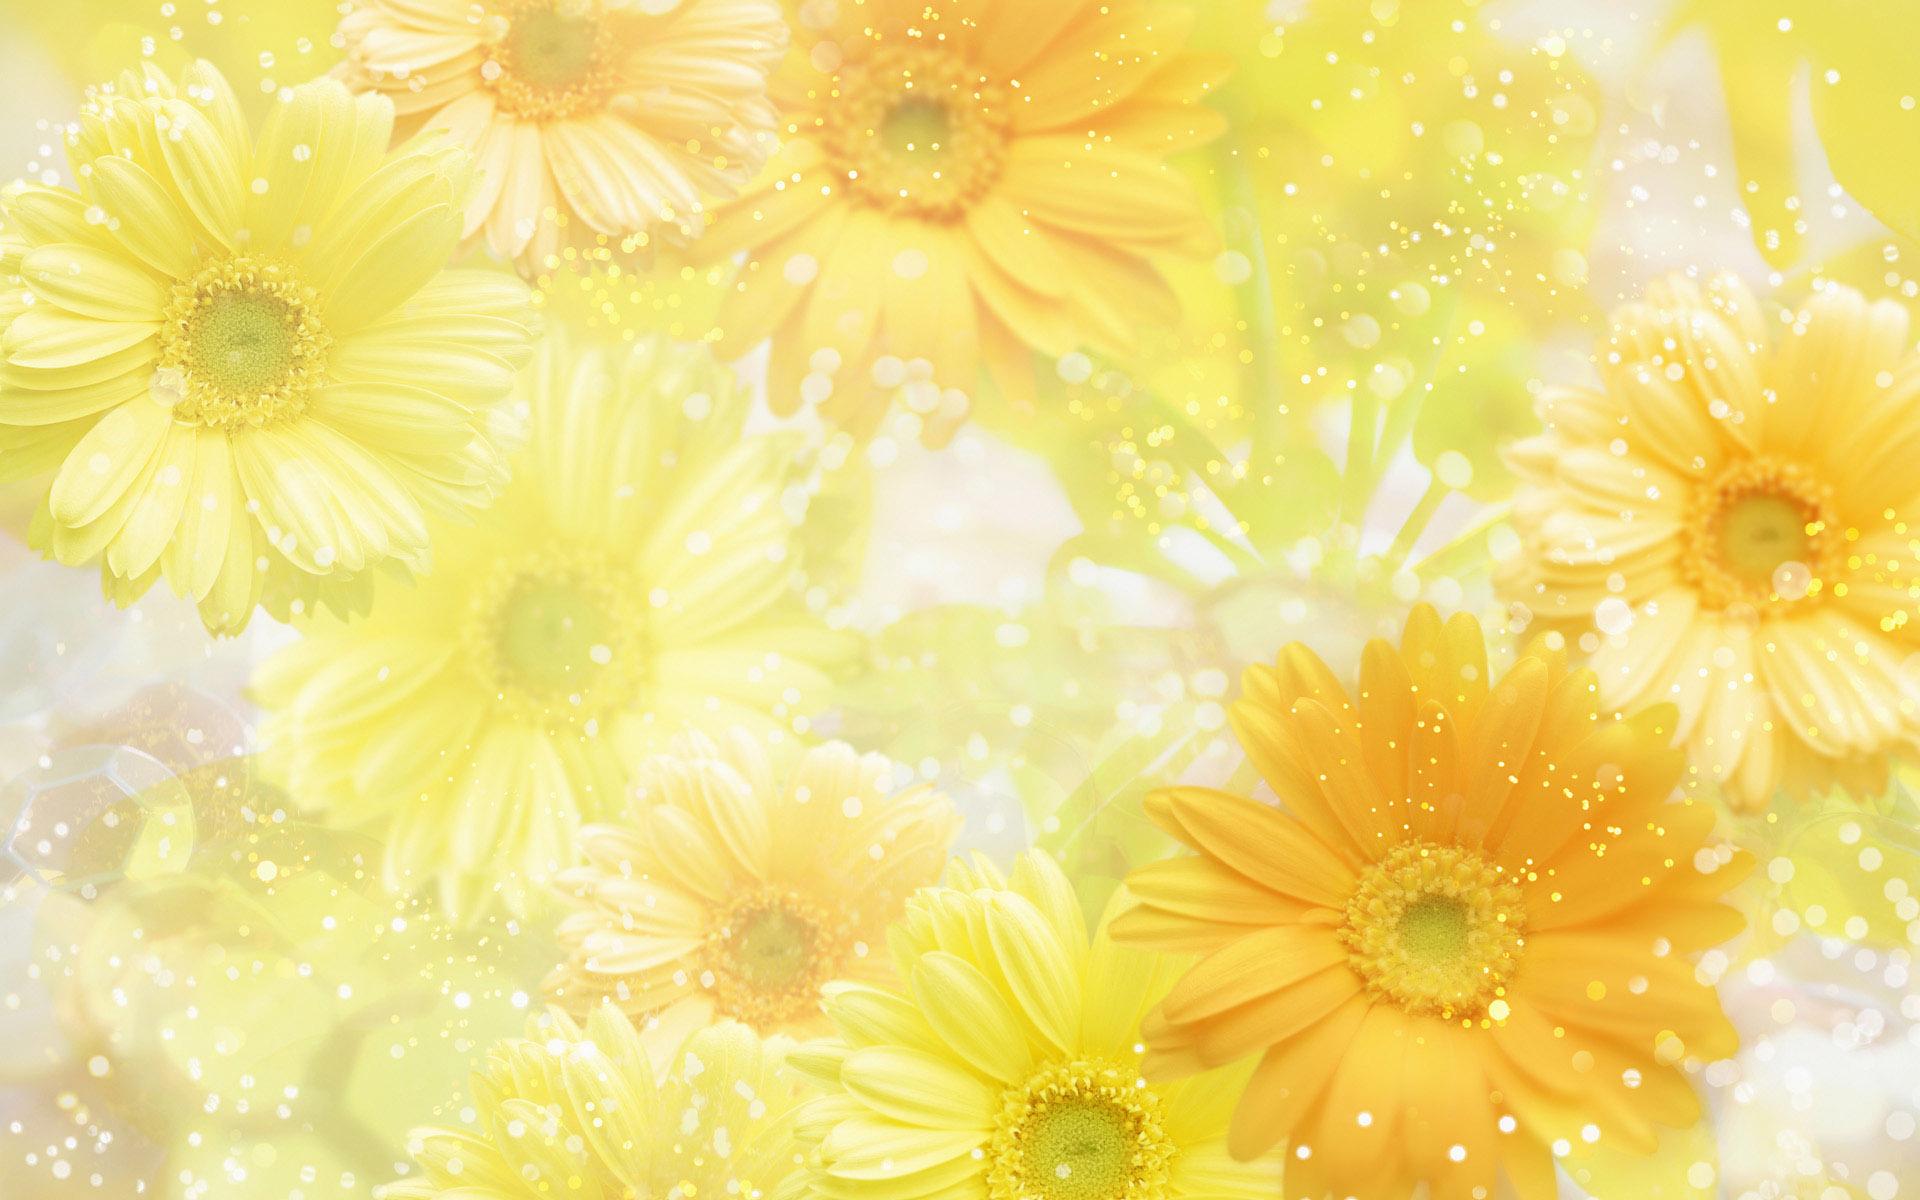 Spring Wallpapers Hd Desktop Background Free Flowers Spring Wallpapers